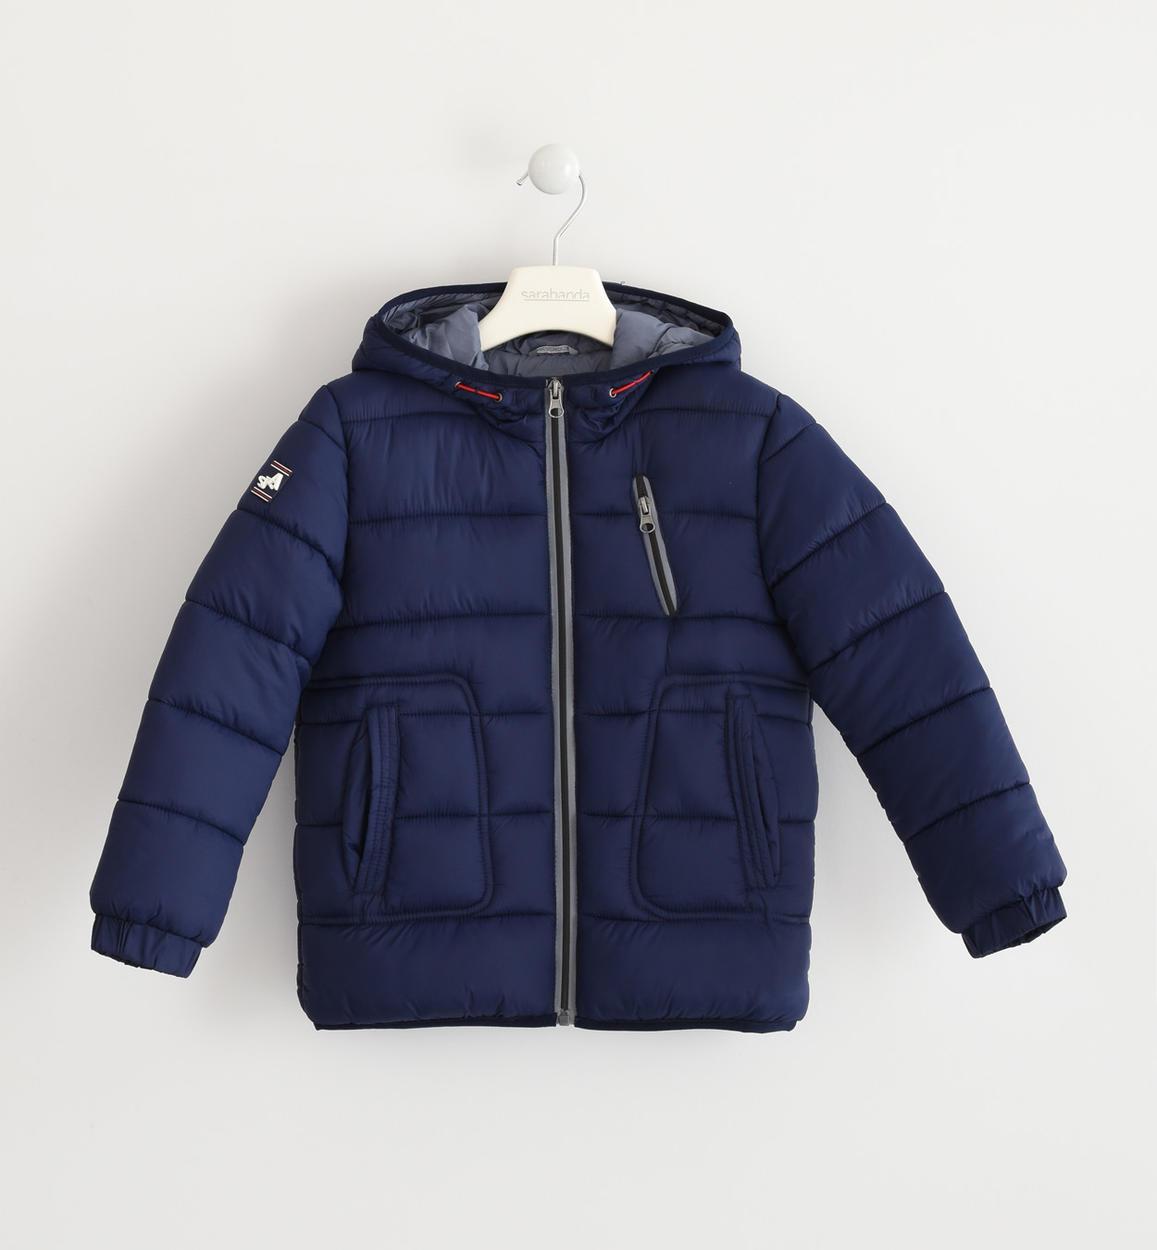 purchase cheap 7ae72 de1bd Piumino invernale Sarabanda in nylon per bambino da 6 a 16 anni Sarabanda